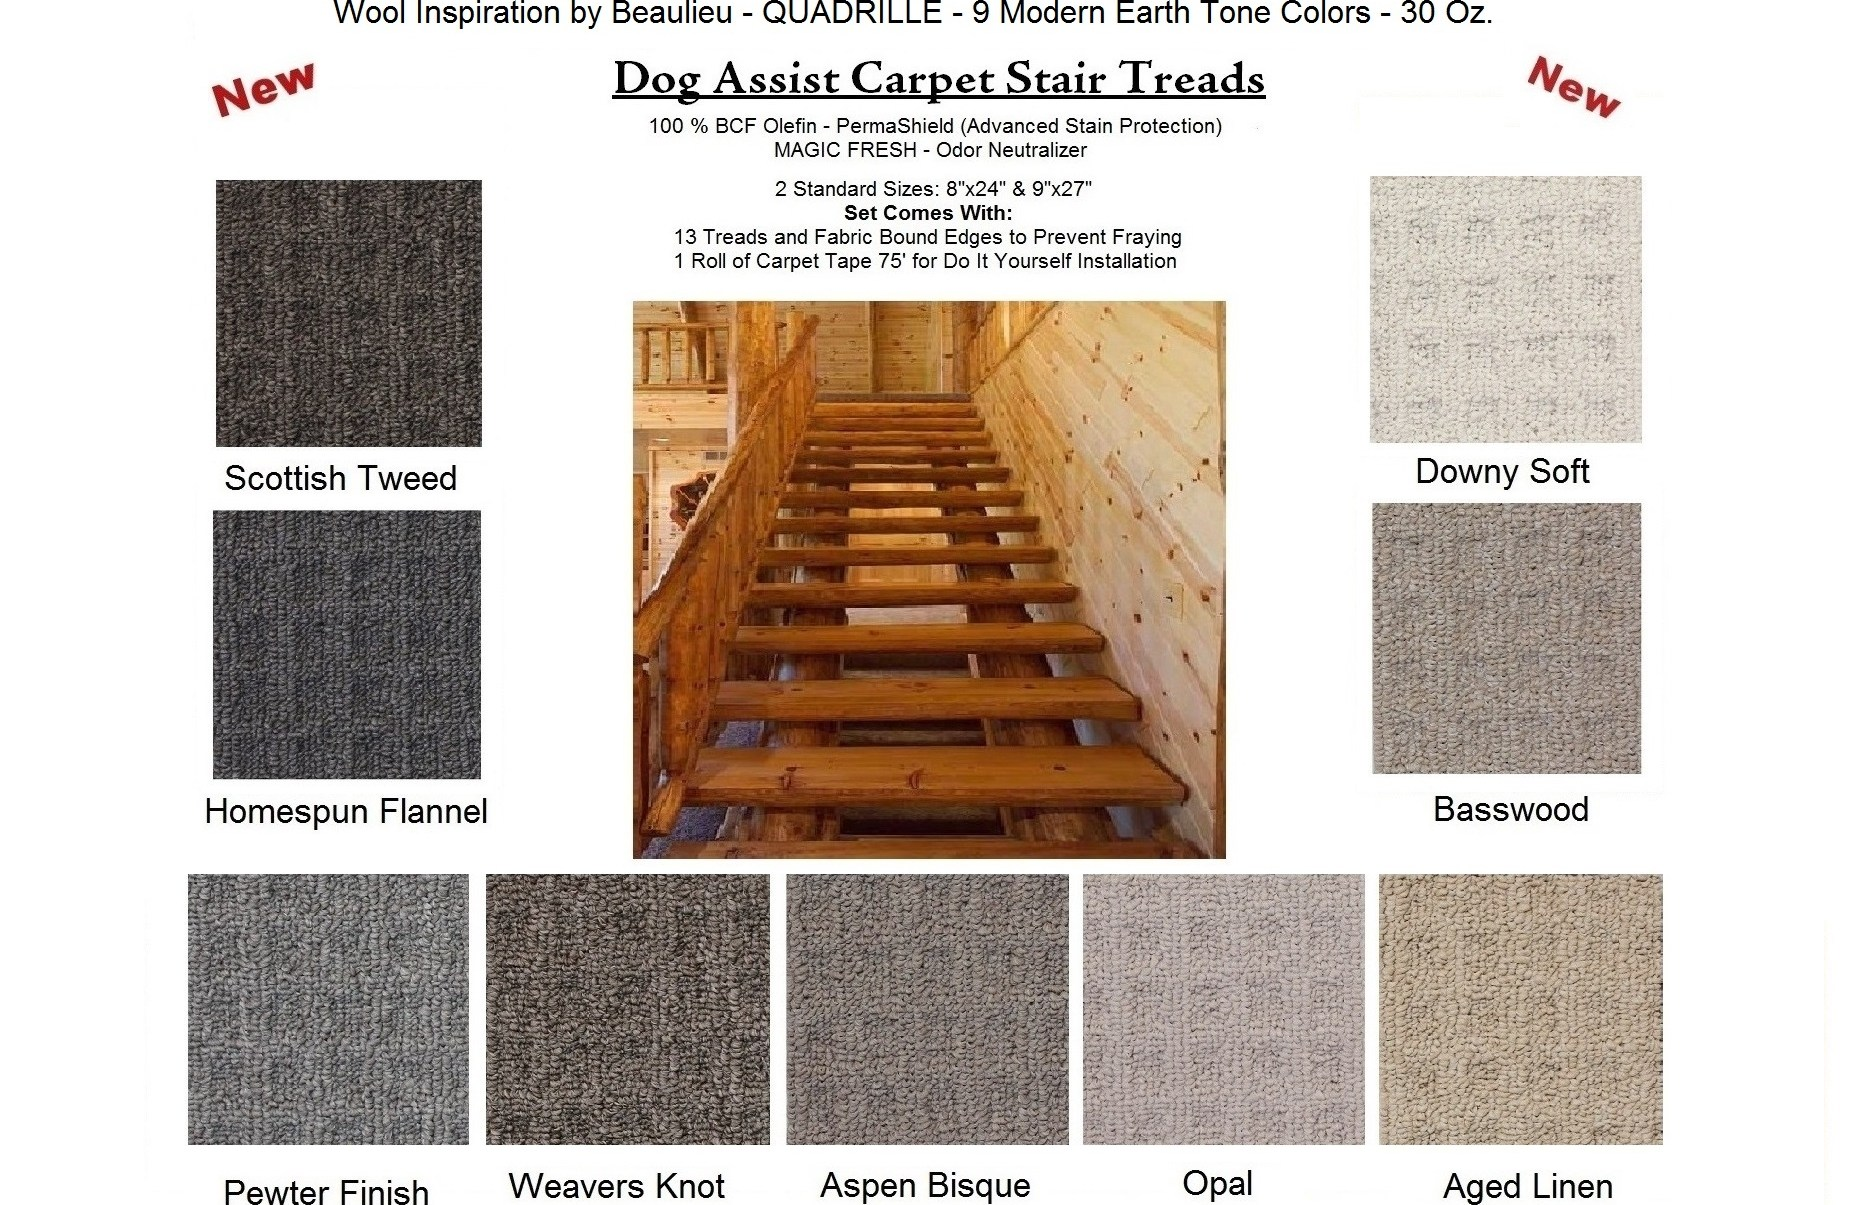 Quadrille Dog Assist Carpet Stair Treads   Wool Carpet Stair Treads   Zealand Wool   Bullnose Padded   Flooring   Plush Carpet   Cat Pet